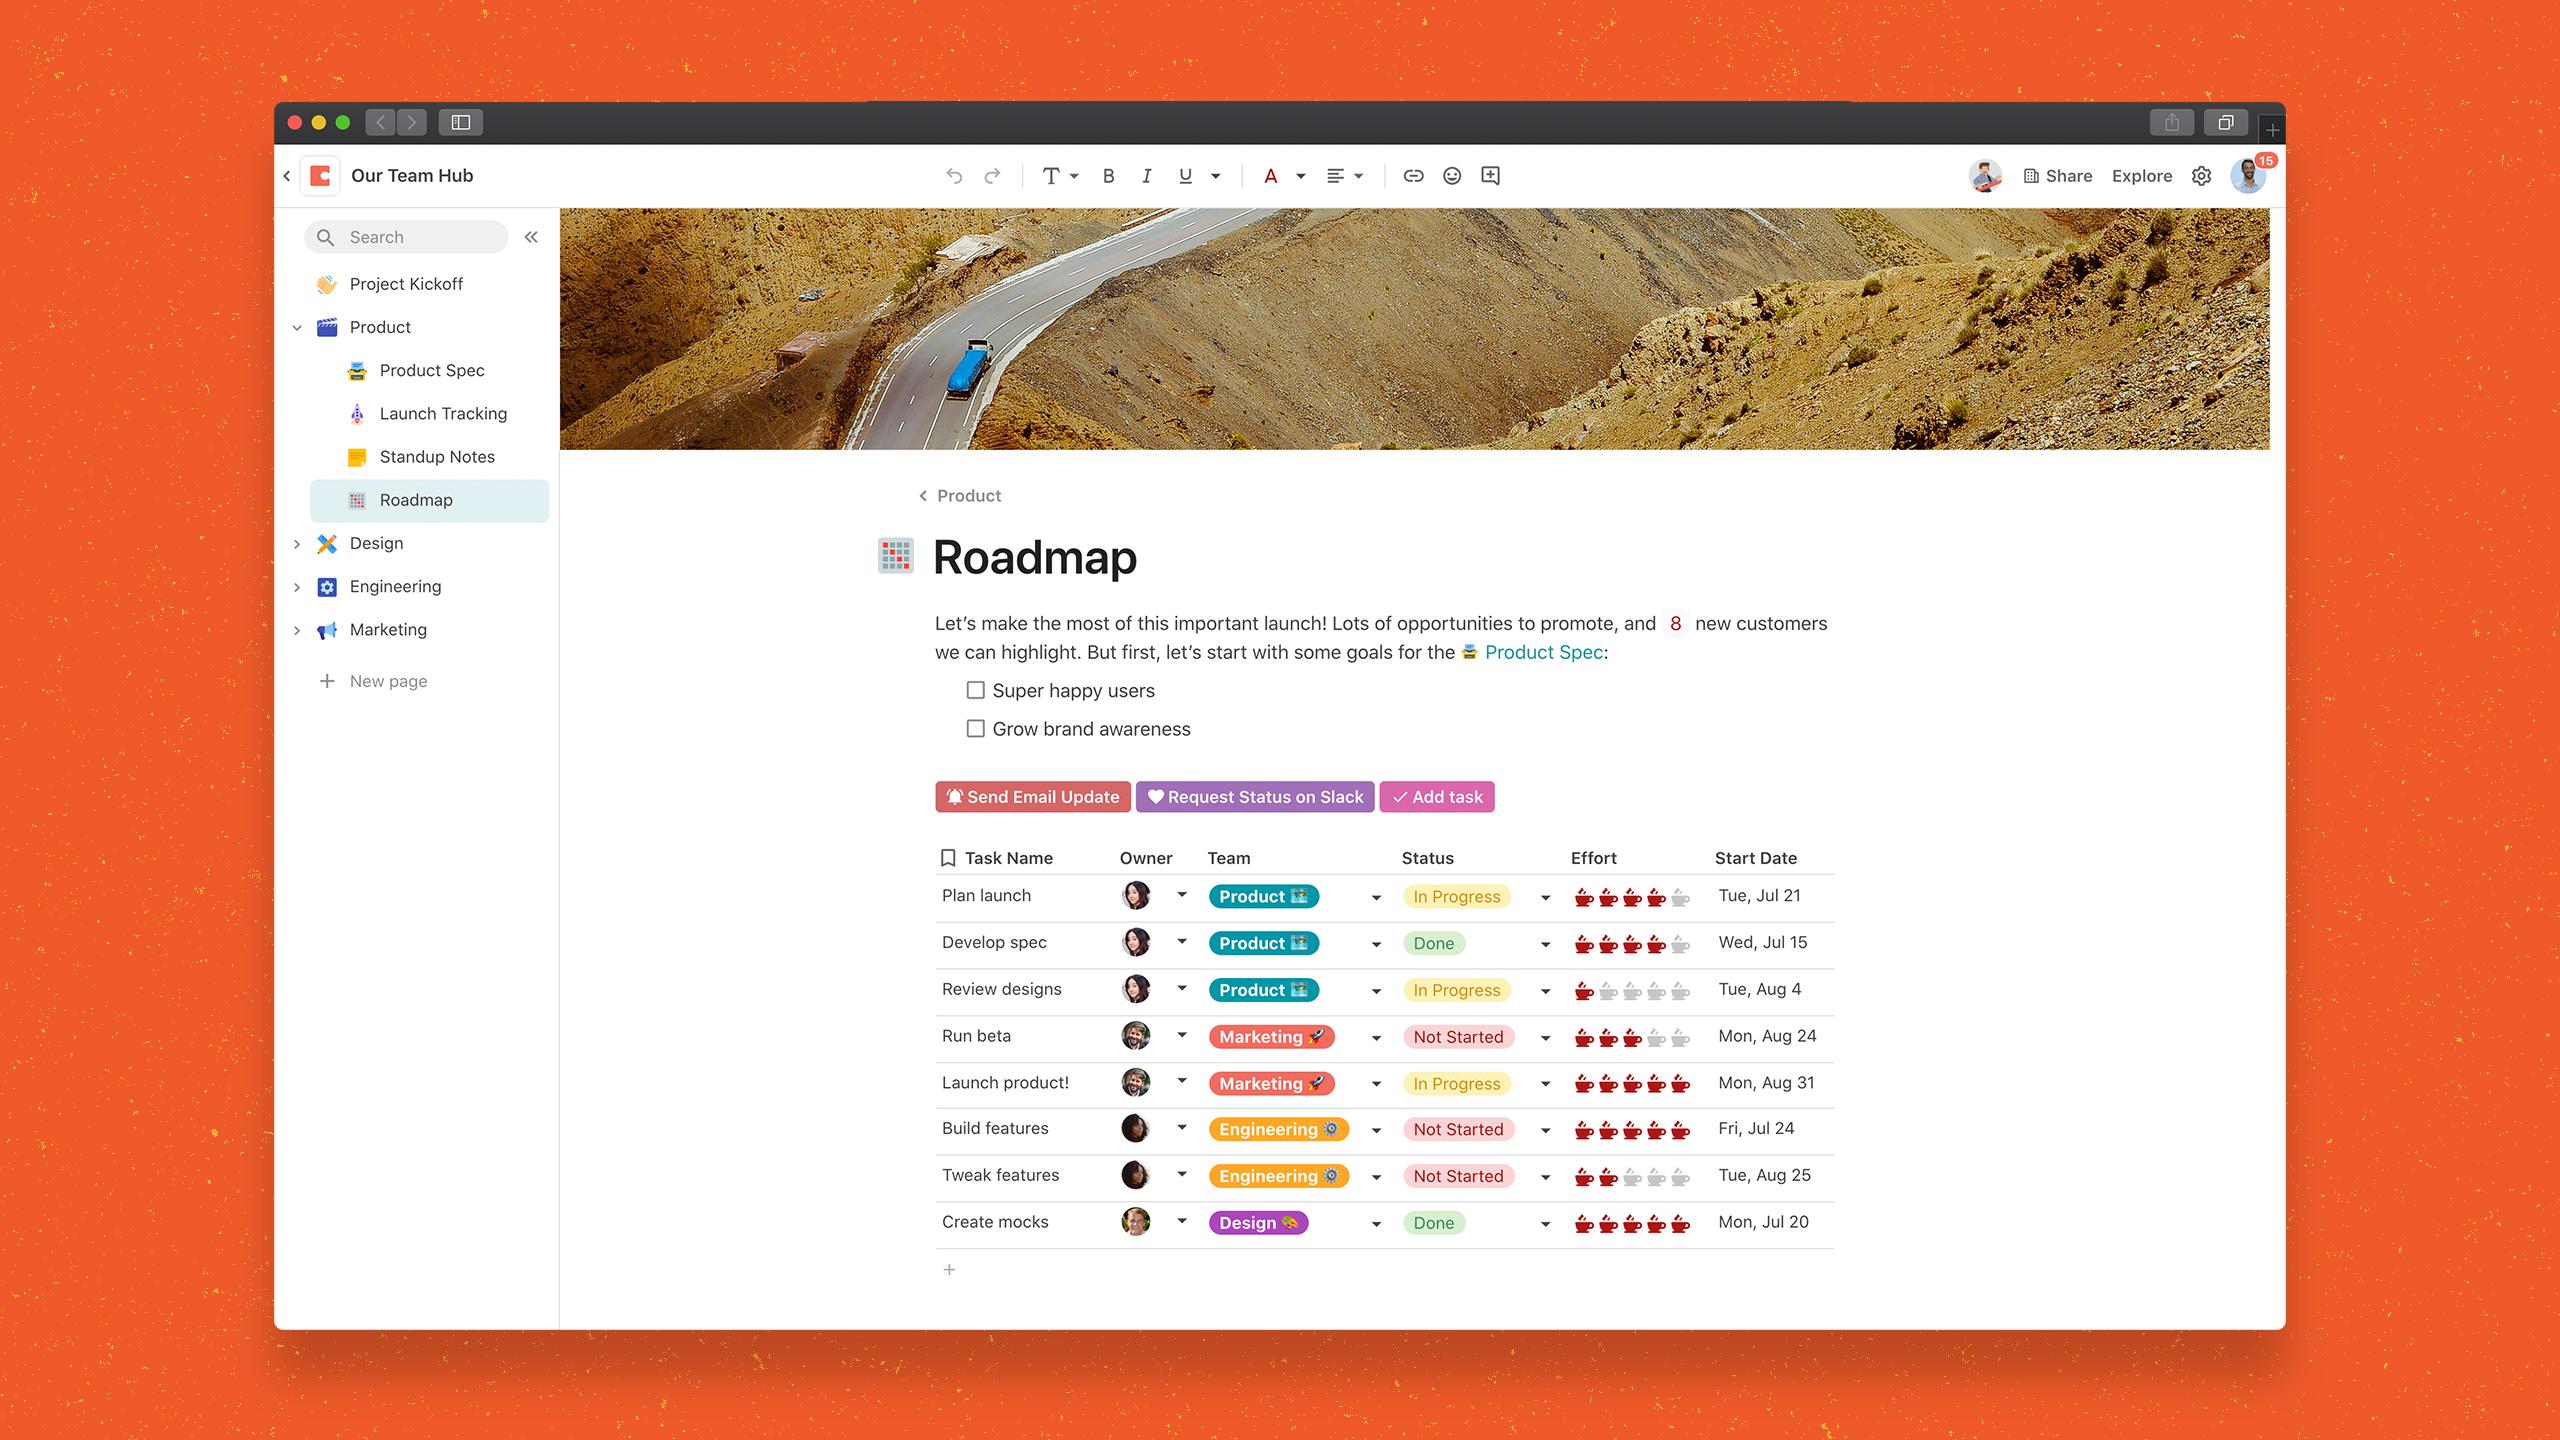 Online document startup and G Suite alternative Coda raises $80M - SiliconANGLE